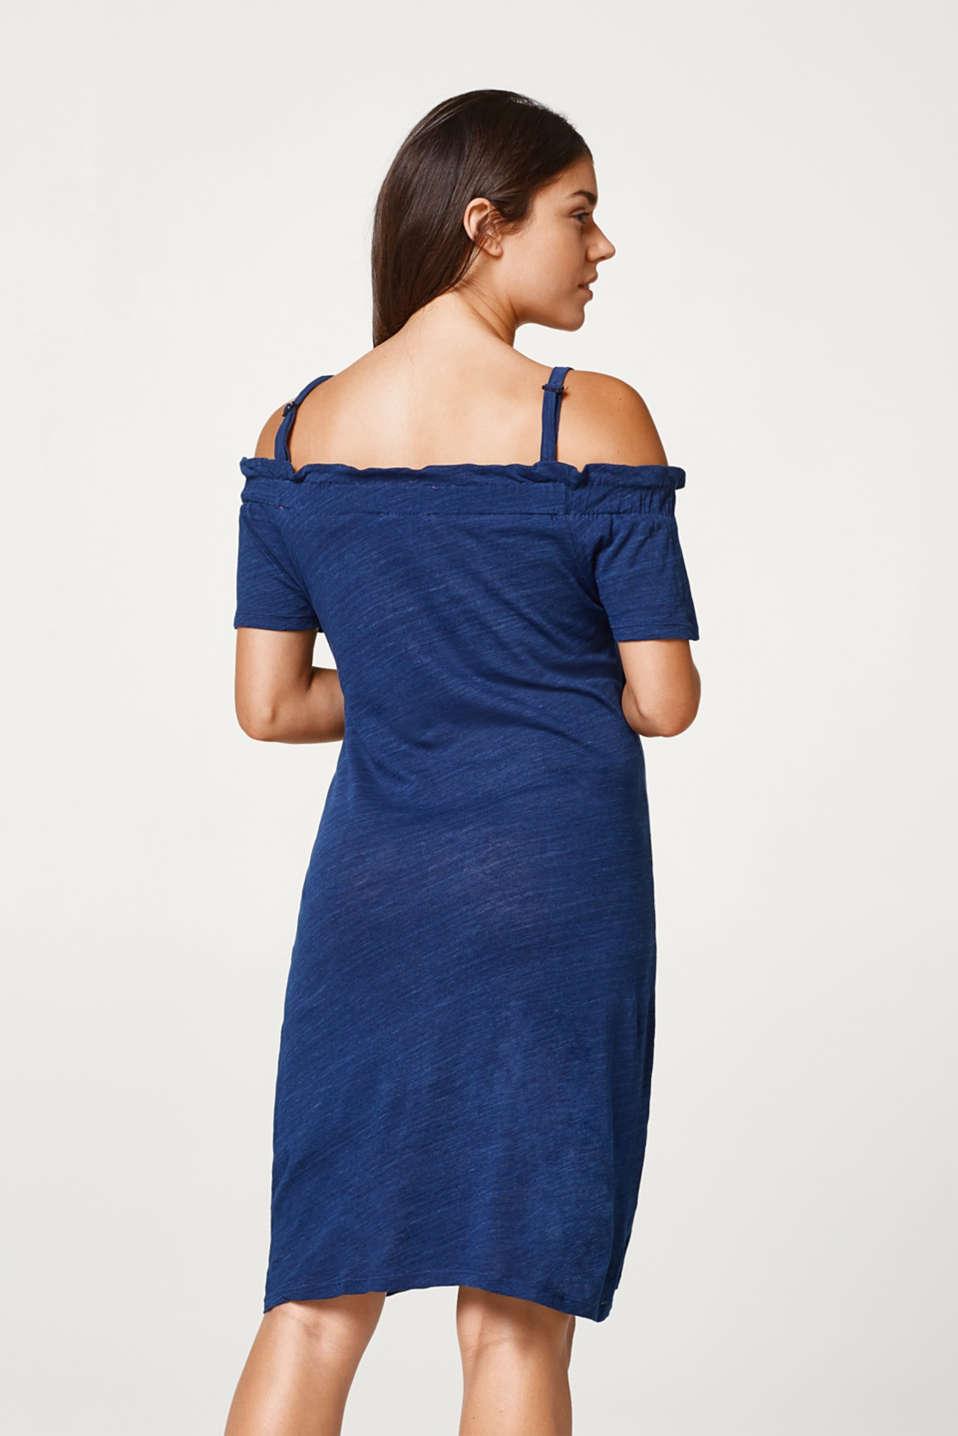 Slub jersey nursing dress, LCAZURE BLUE, detail image number 2